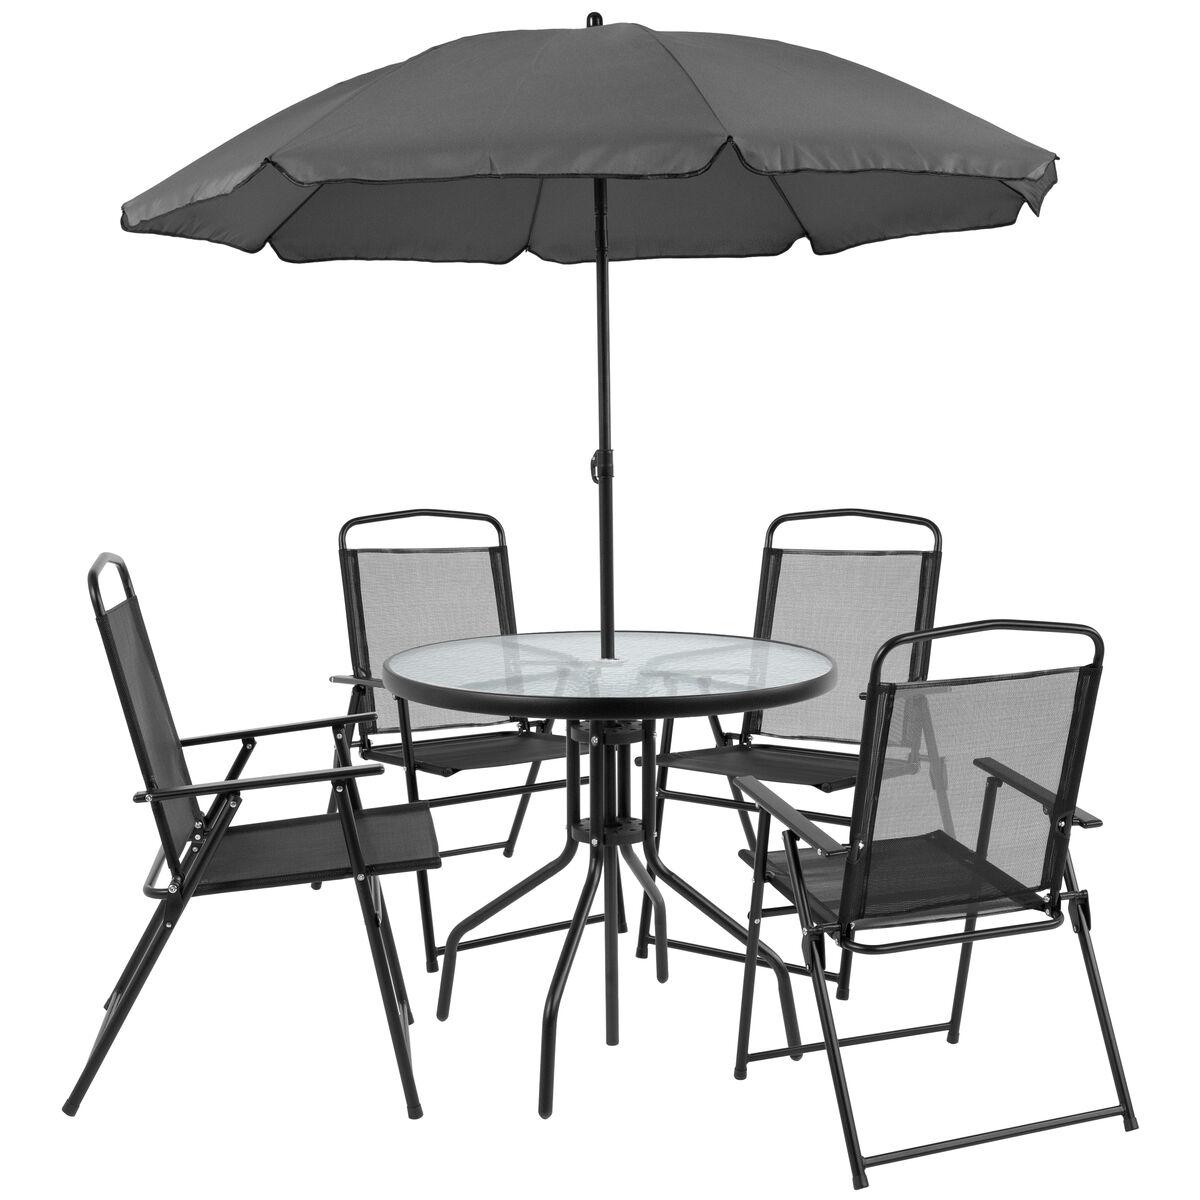 6pc Black Patio Set Umbrella Gm 202012 Bk Gg Foldingchairs4less Com